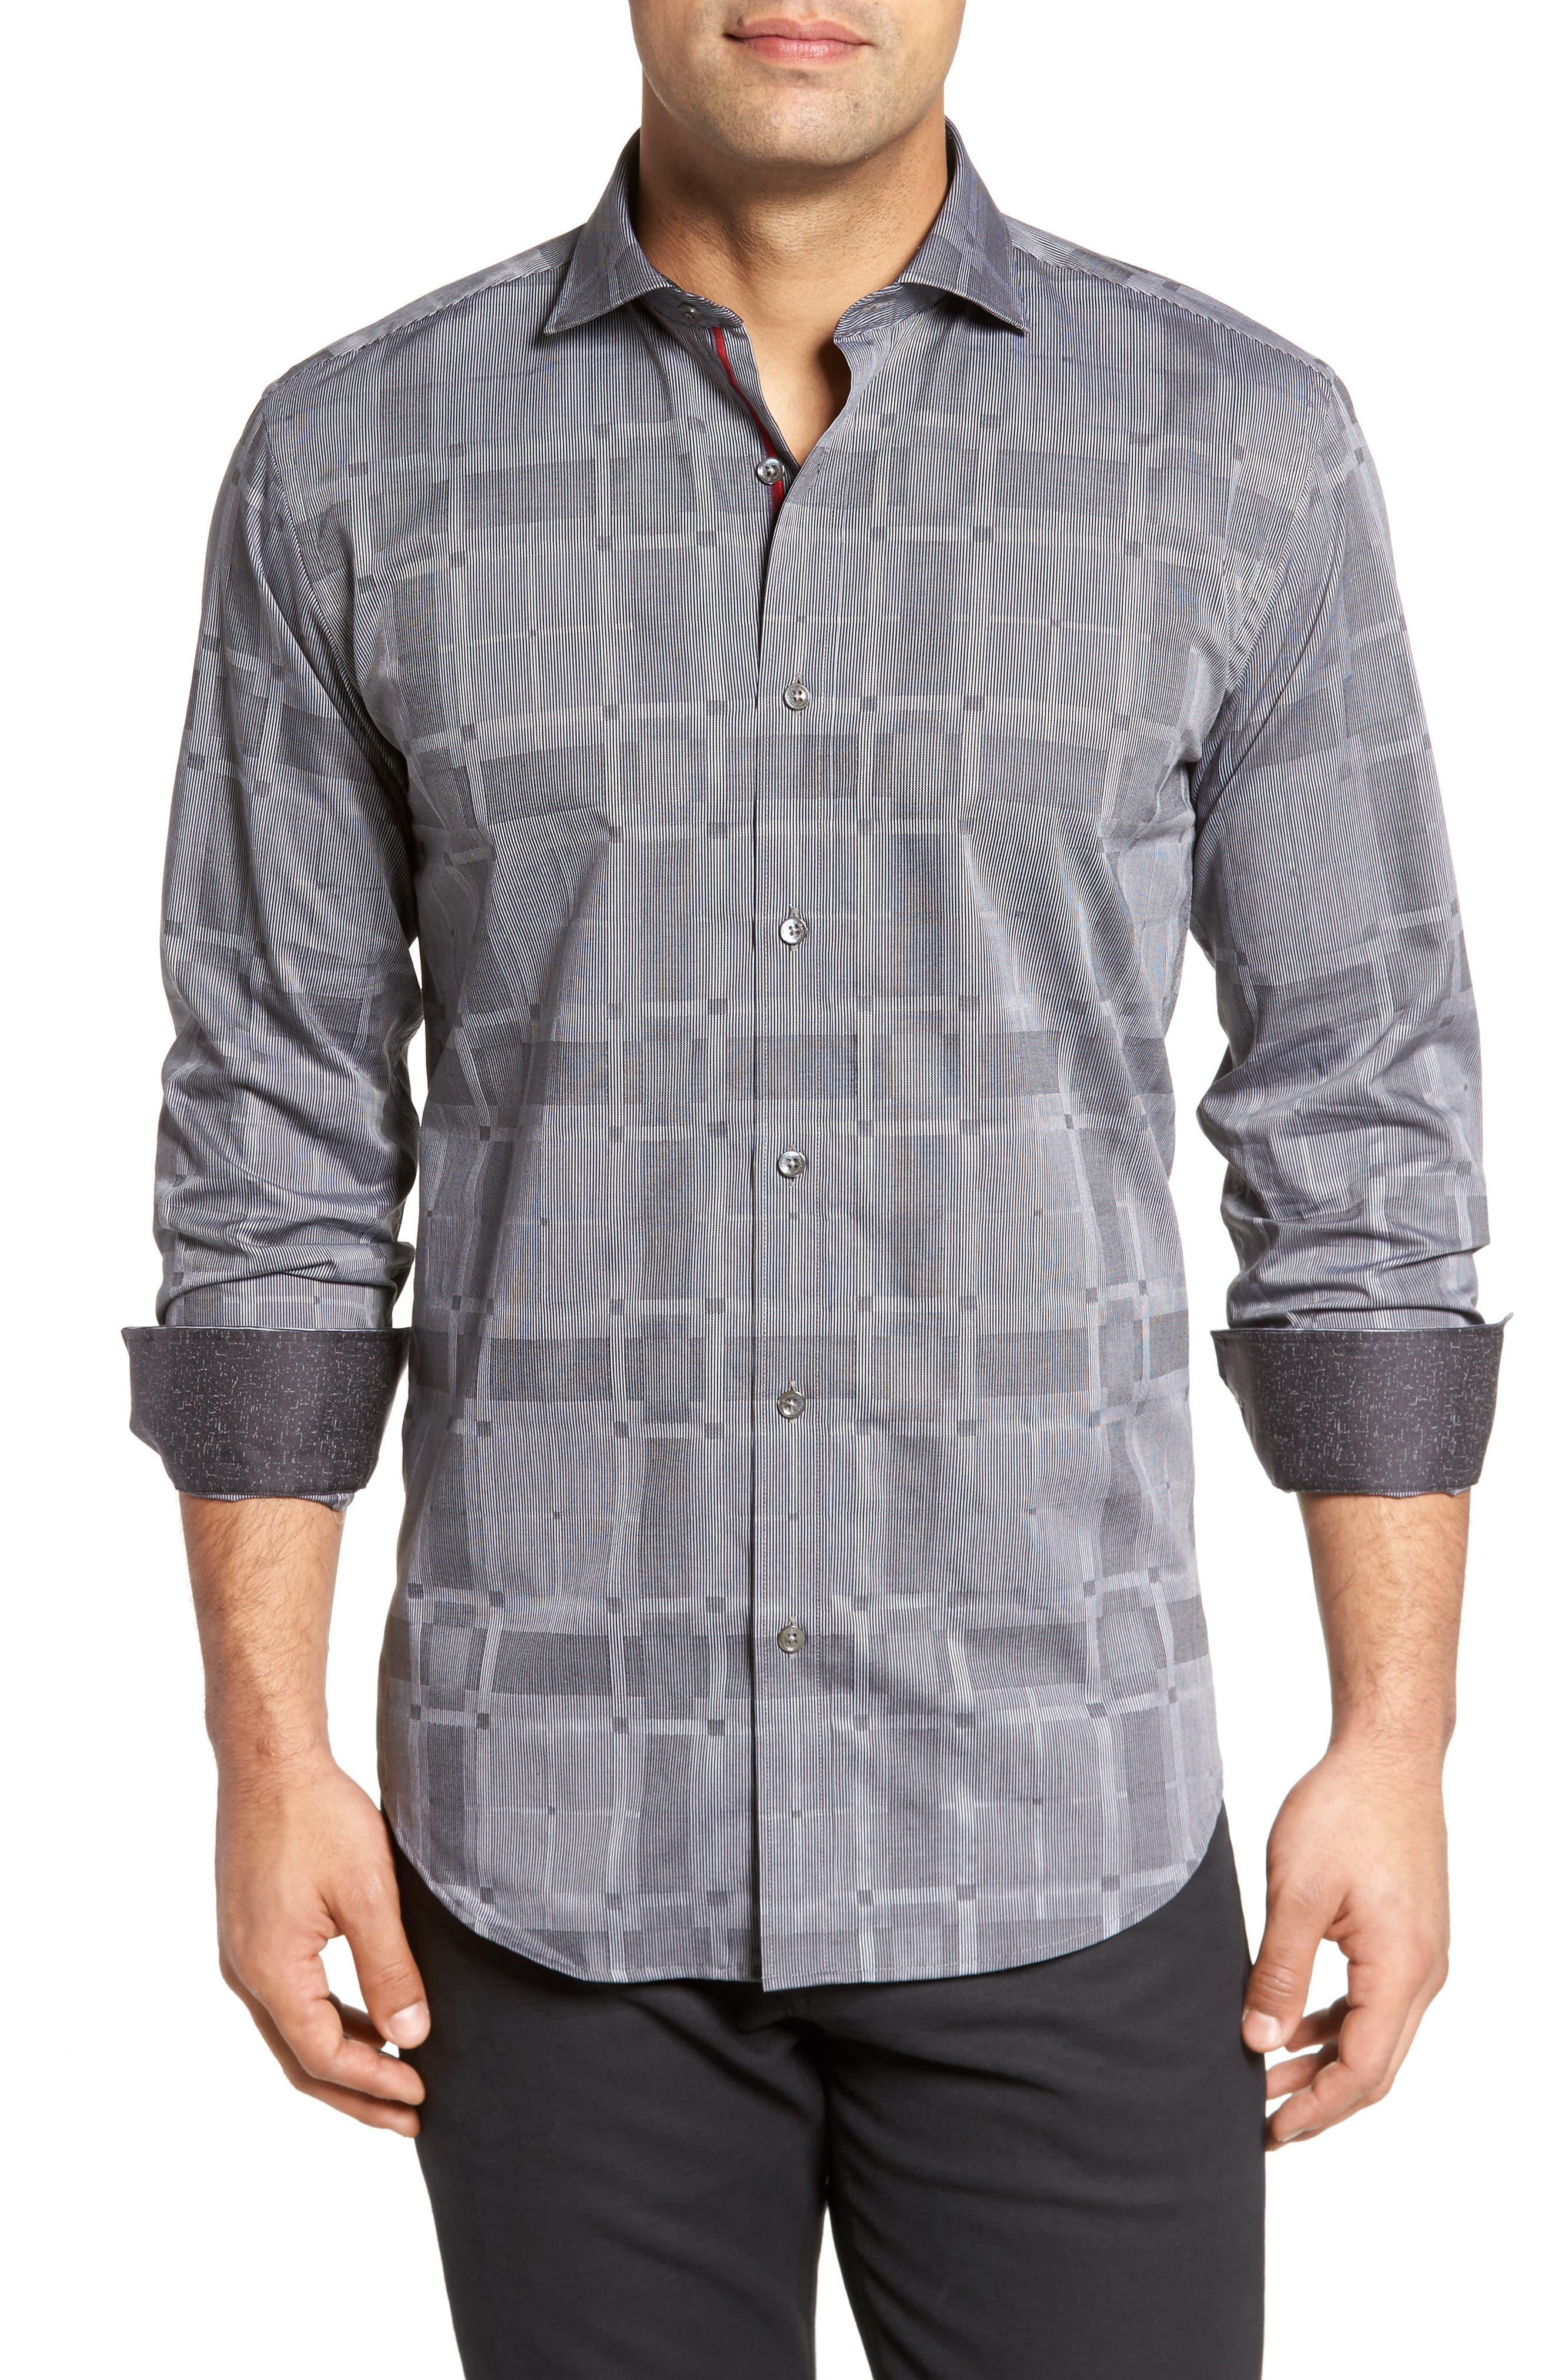 Main Image - Bugatchi Slim Fit Microstripe Plaid Sport Shirt